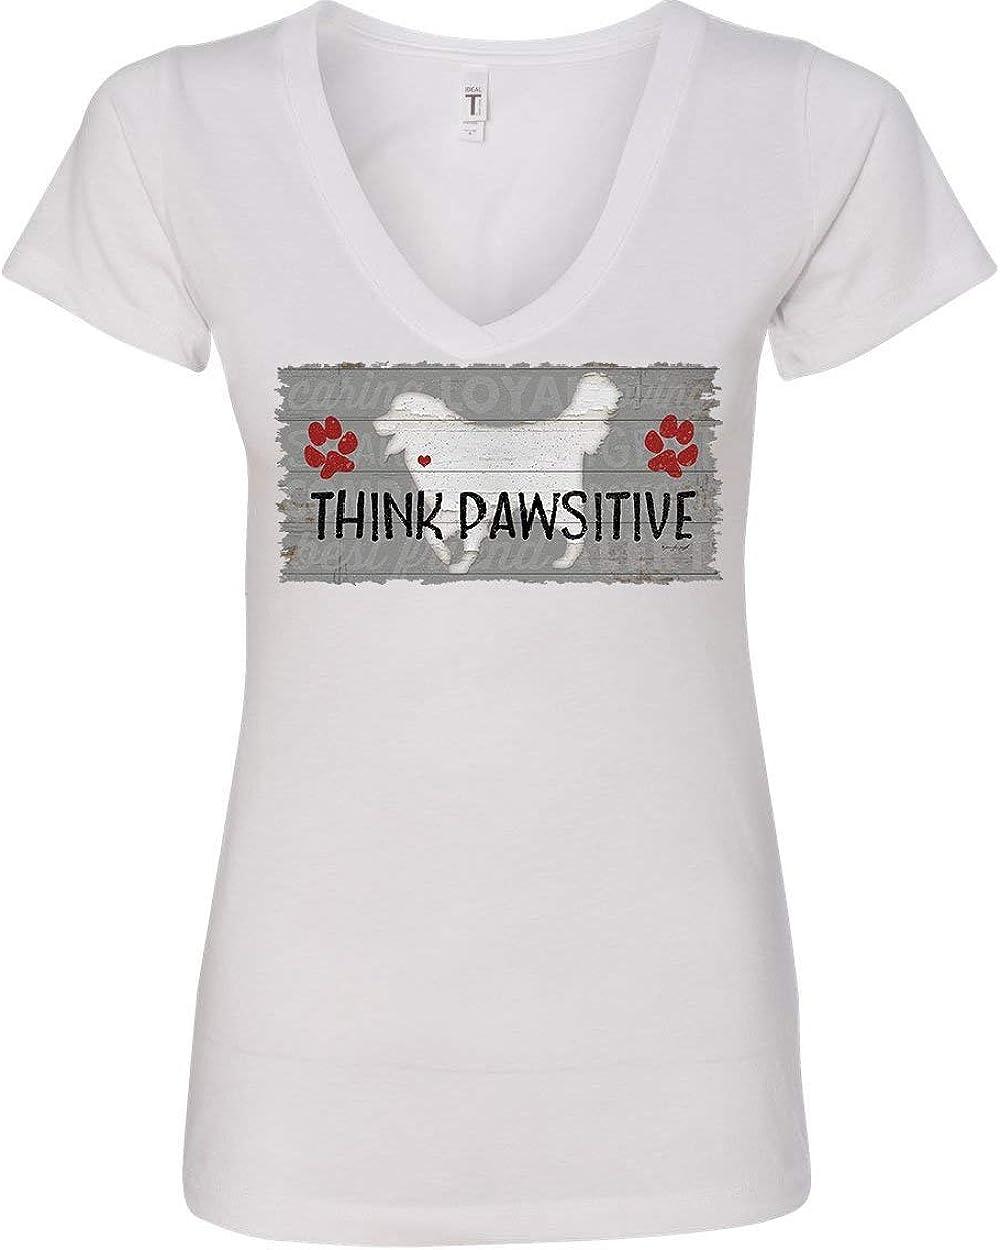 Think Pawsitive Womens V-Neck T-Shirt Dog Rescue Breed Retriever Pet Friend